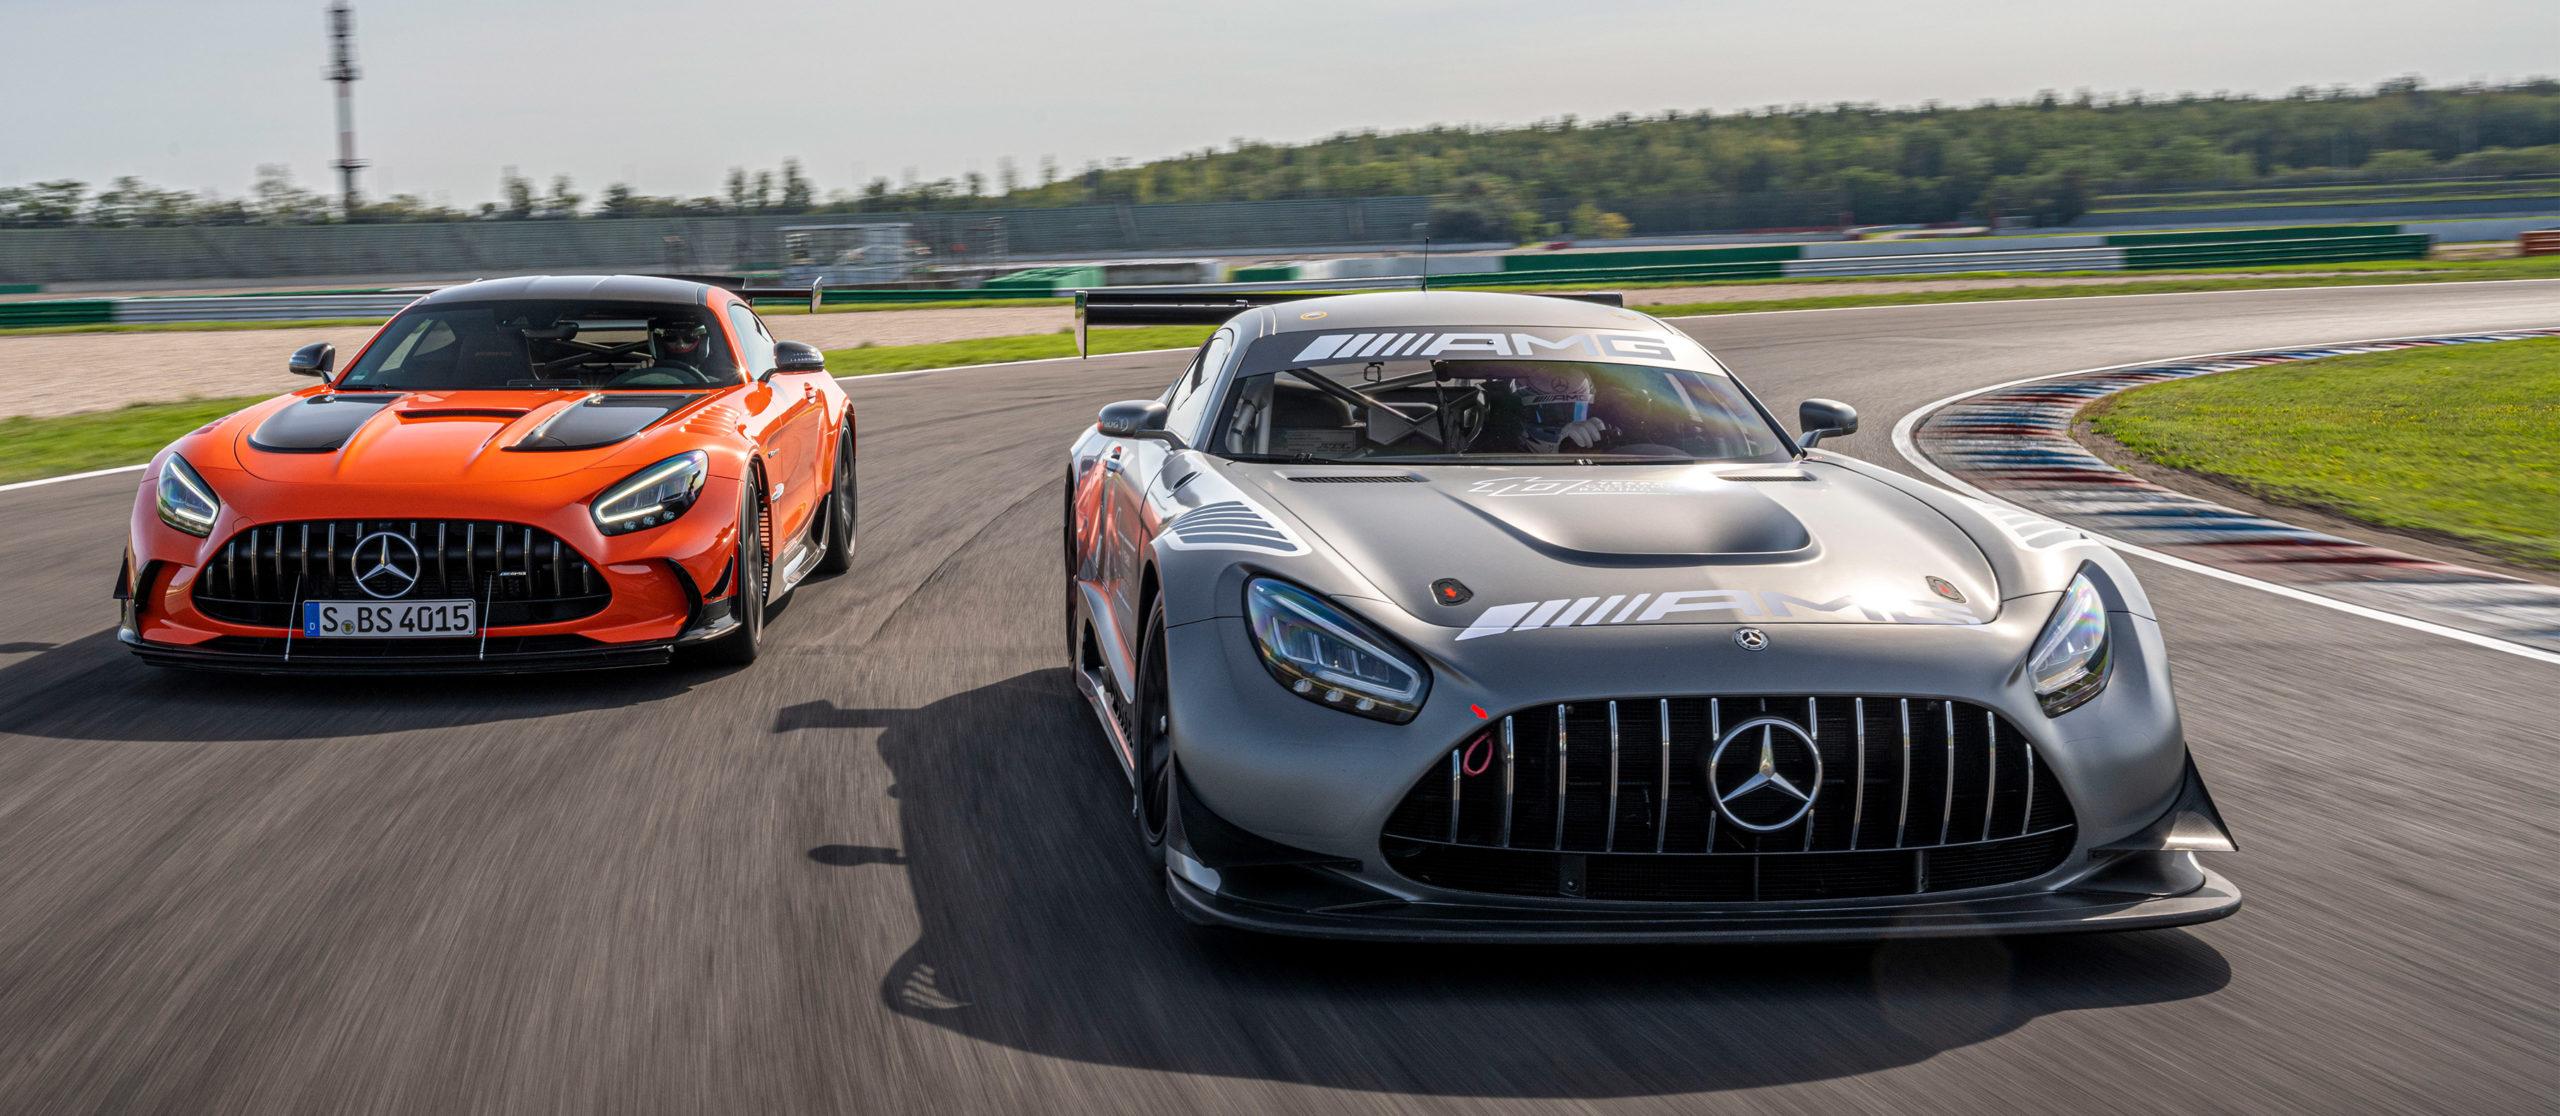 Mercedes-AMG GT Black Series ya disponible en el mercado